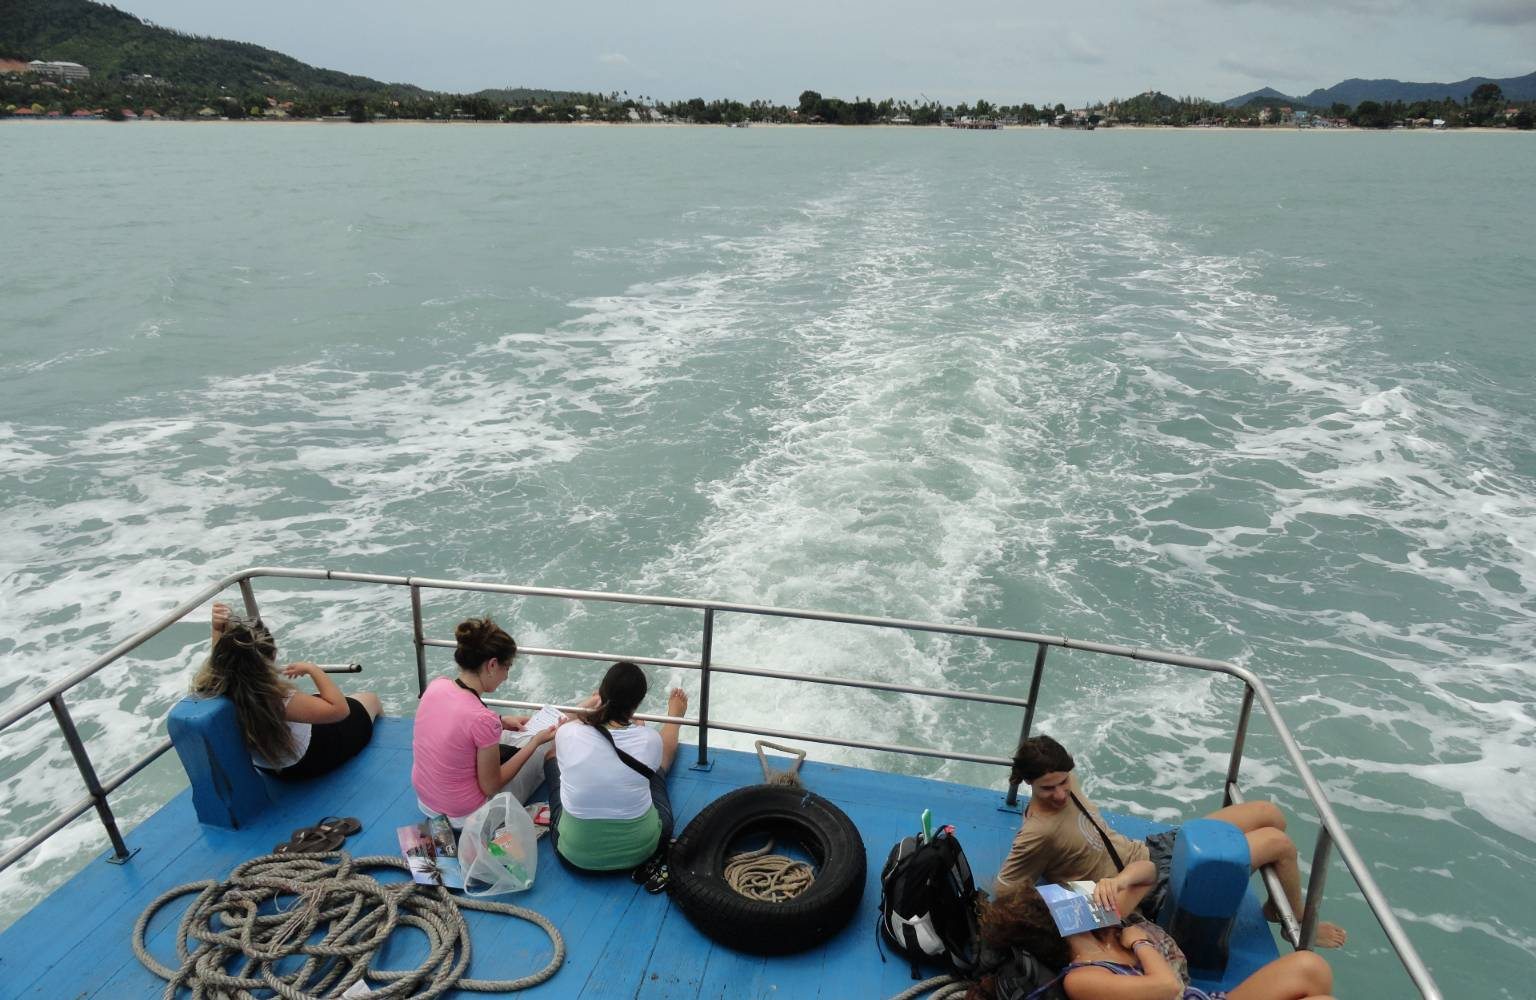 The ferry from Chumphon to Koh Tao, Koh Phangan, Koh Samui and final destination Surat Thani.